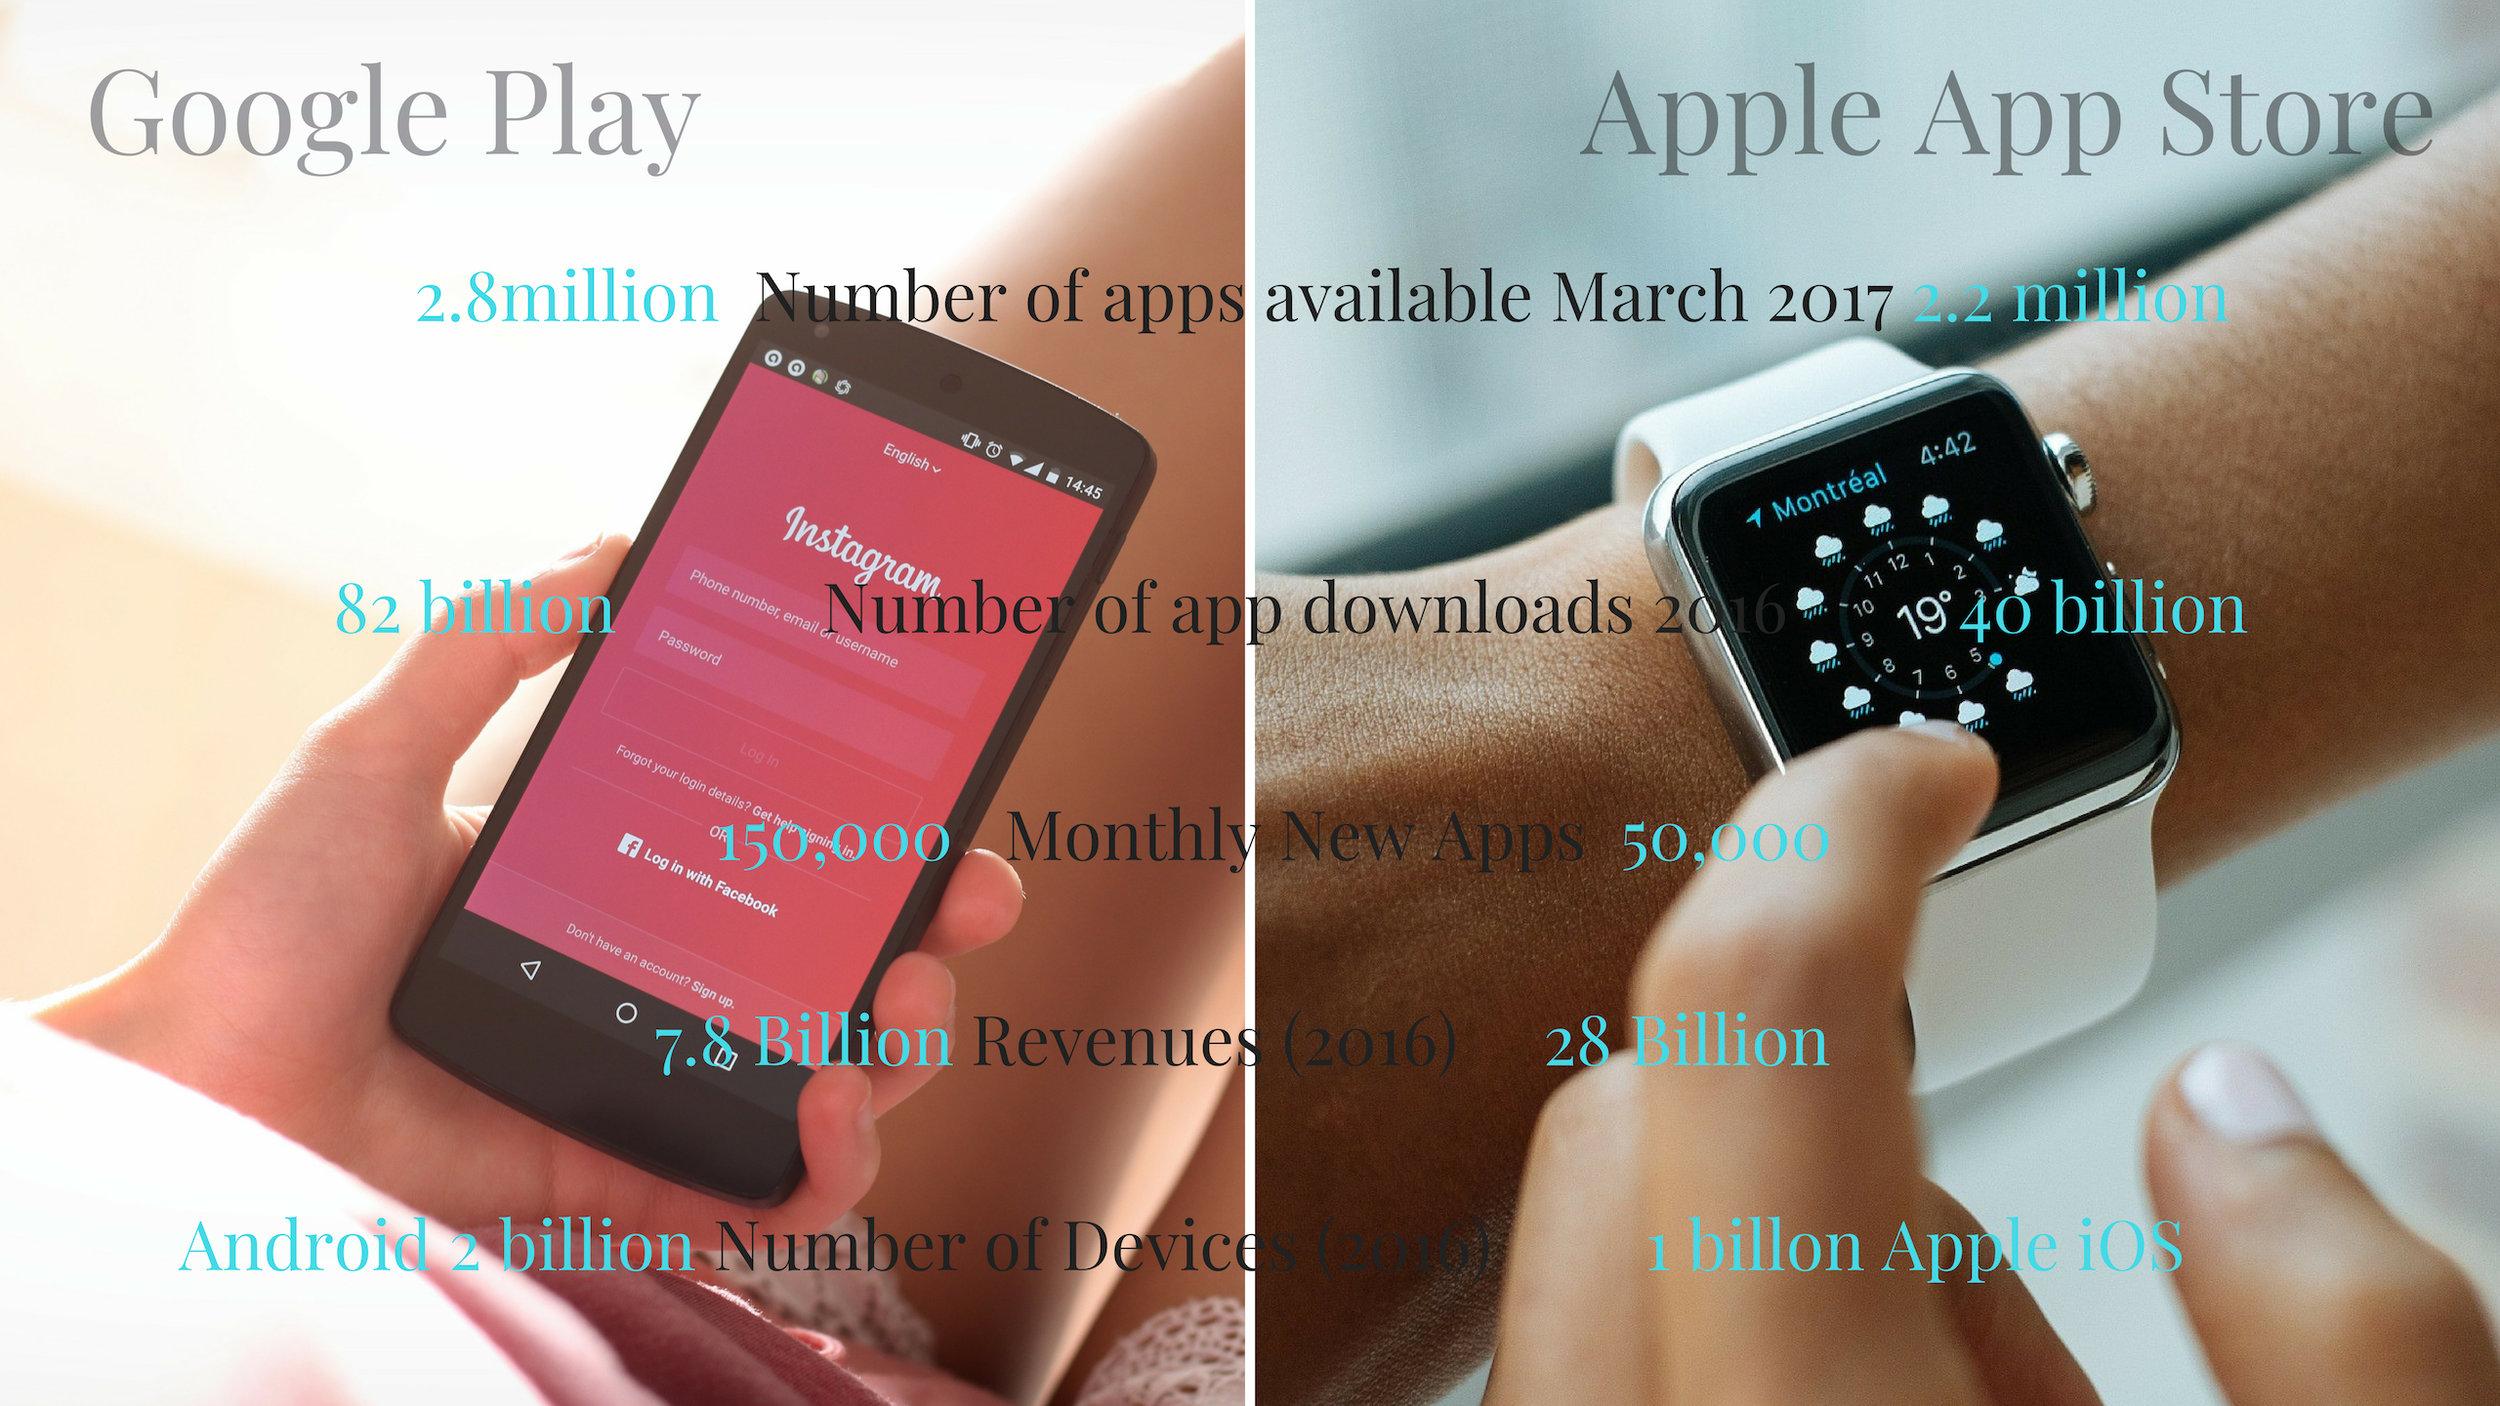 Source: European Parliament Comparison of Google Play & Apple App Store